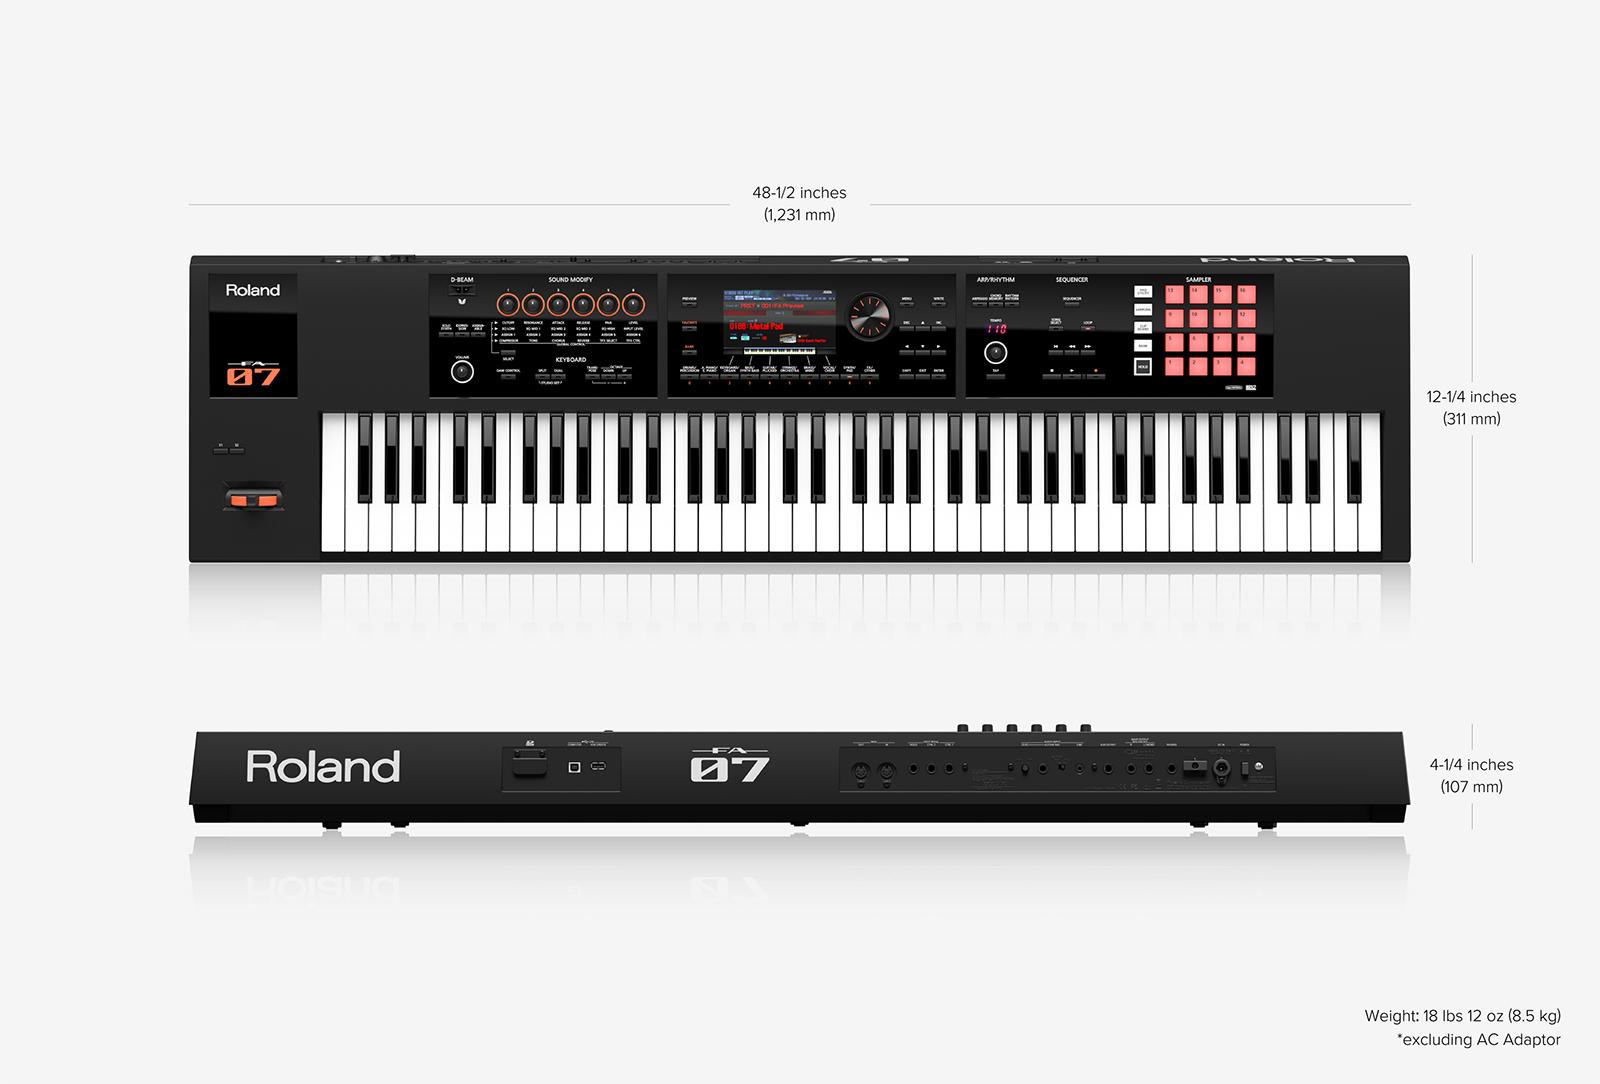 roland fa 07 76 key music synthesizer workstation audioworksct. Black Bedroom Furniture Sets. Home Design Ideas